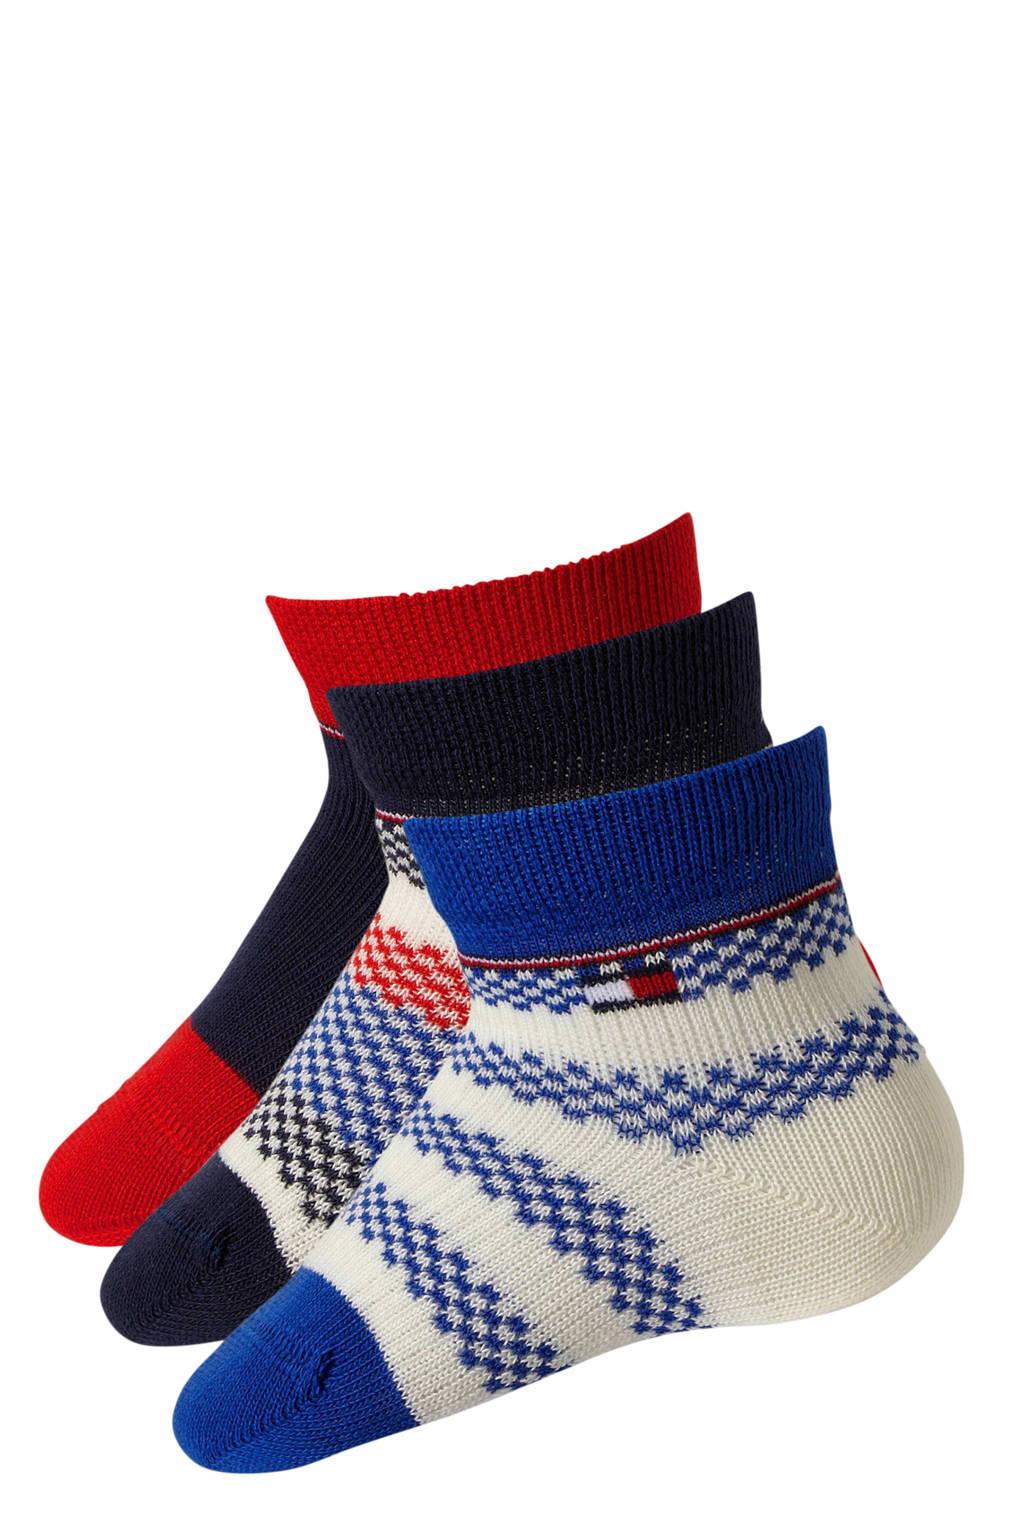 Tommy Hilfiger giftbox baby sokken ( 3 Paar ) blauw, Blauw/marine/rood